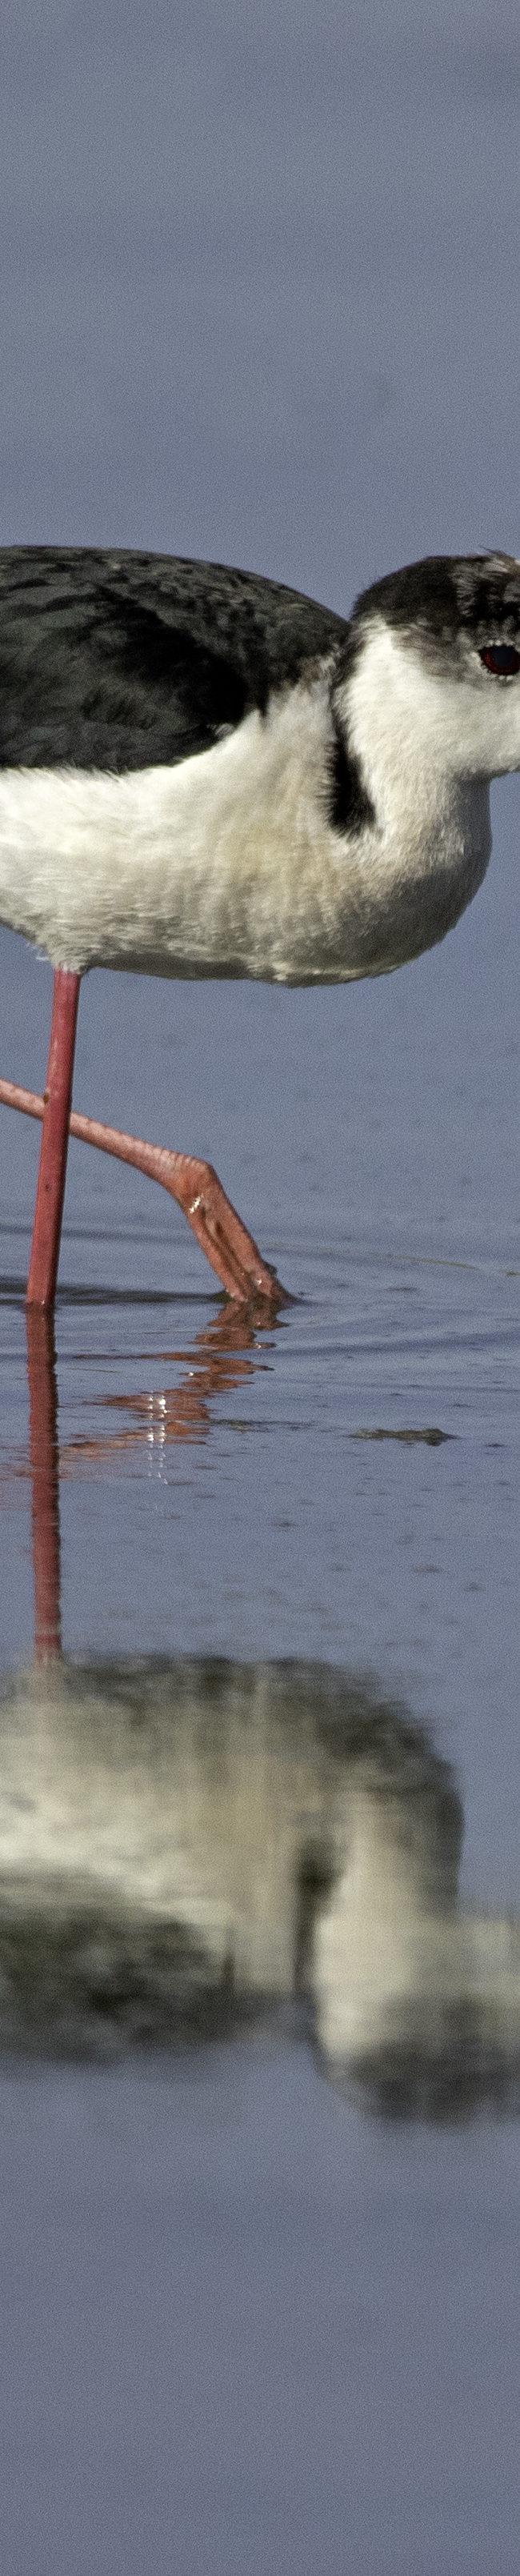 Steltkluut / Black-winged Stilt (Himantopus himantopus)